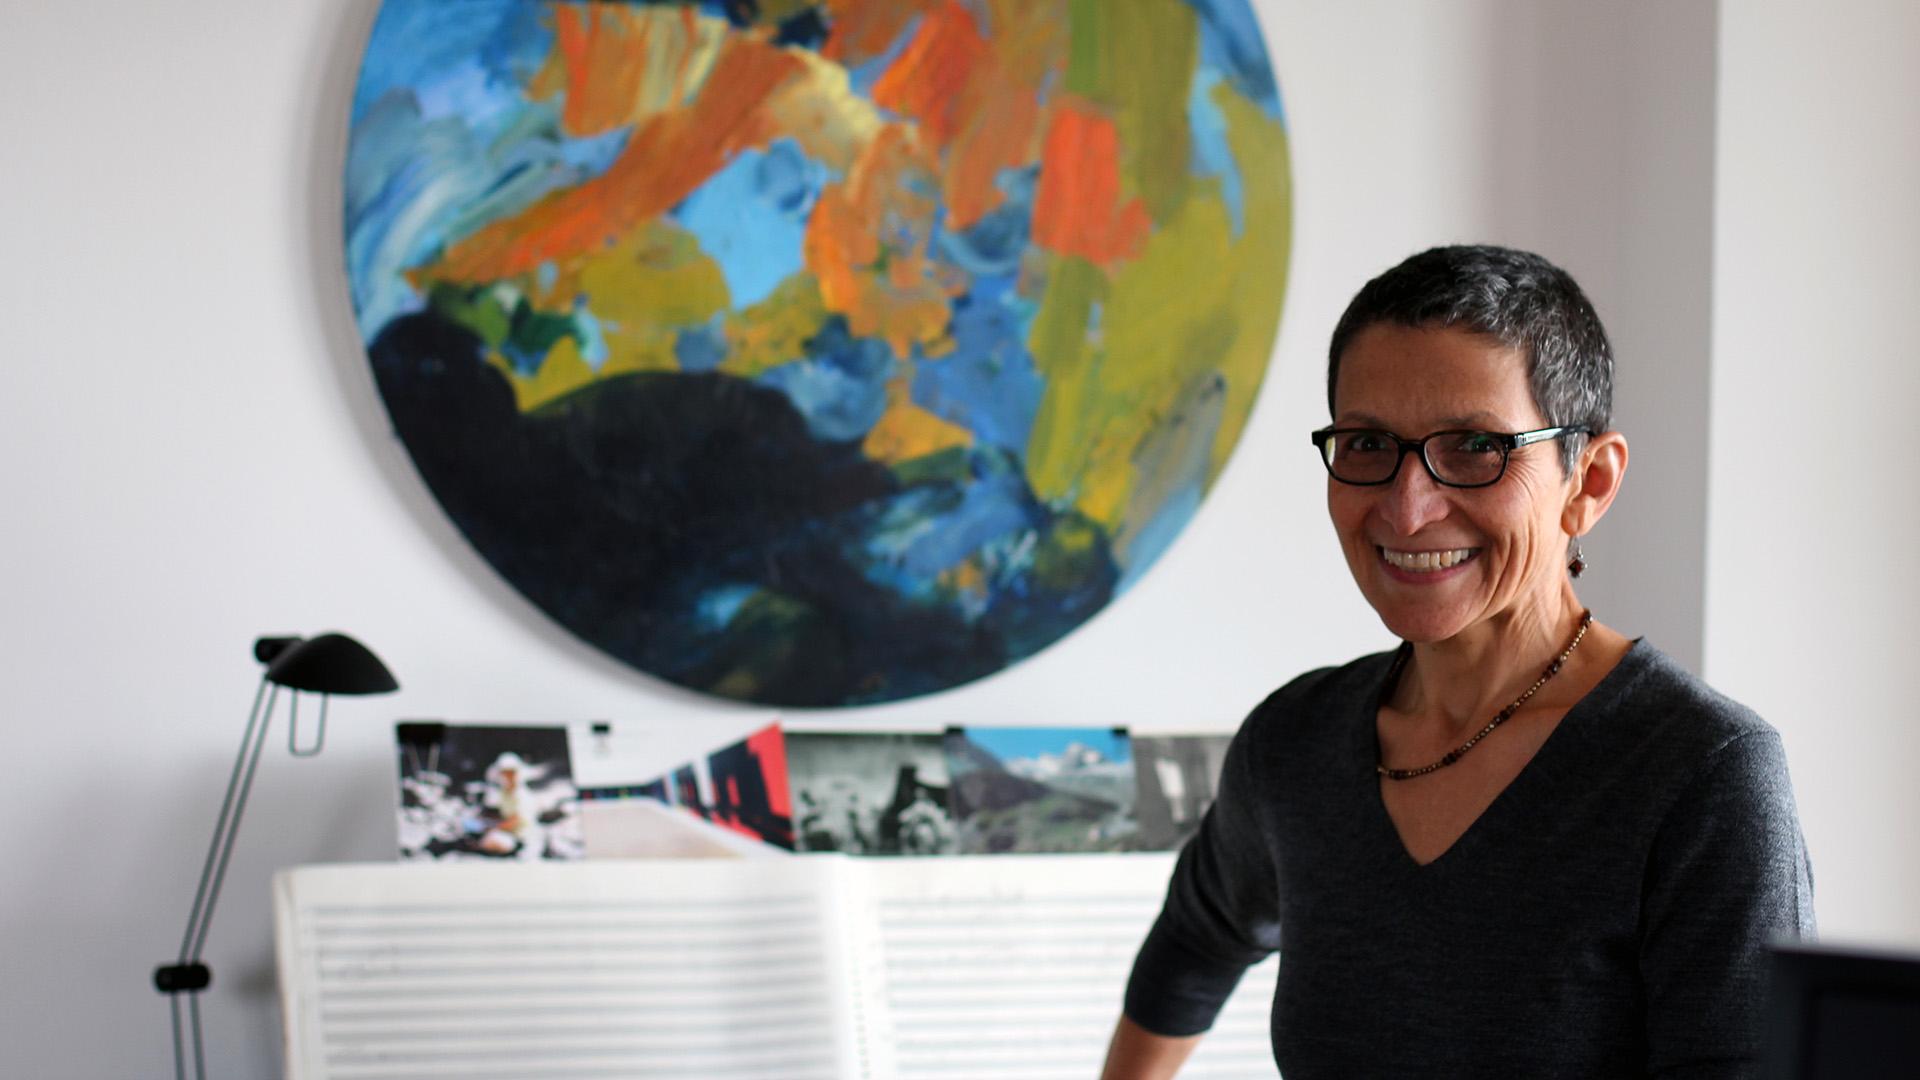 Laura Kaminsky: Every Place Has A Story